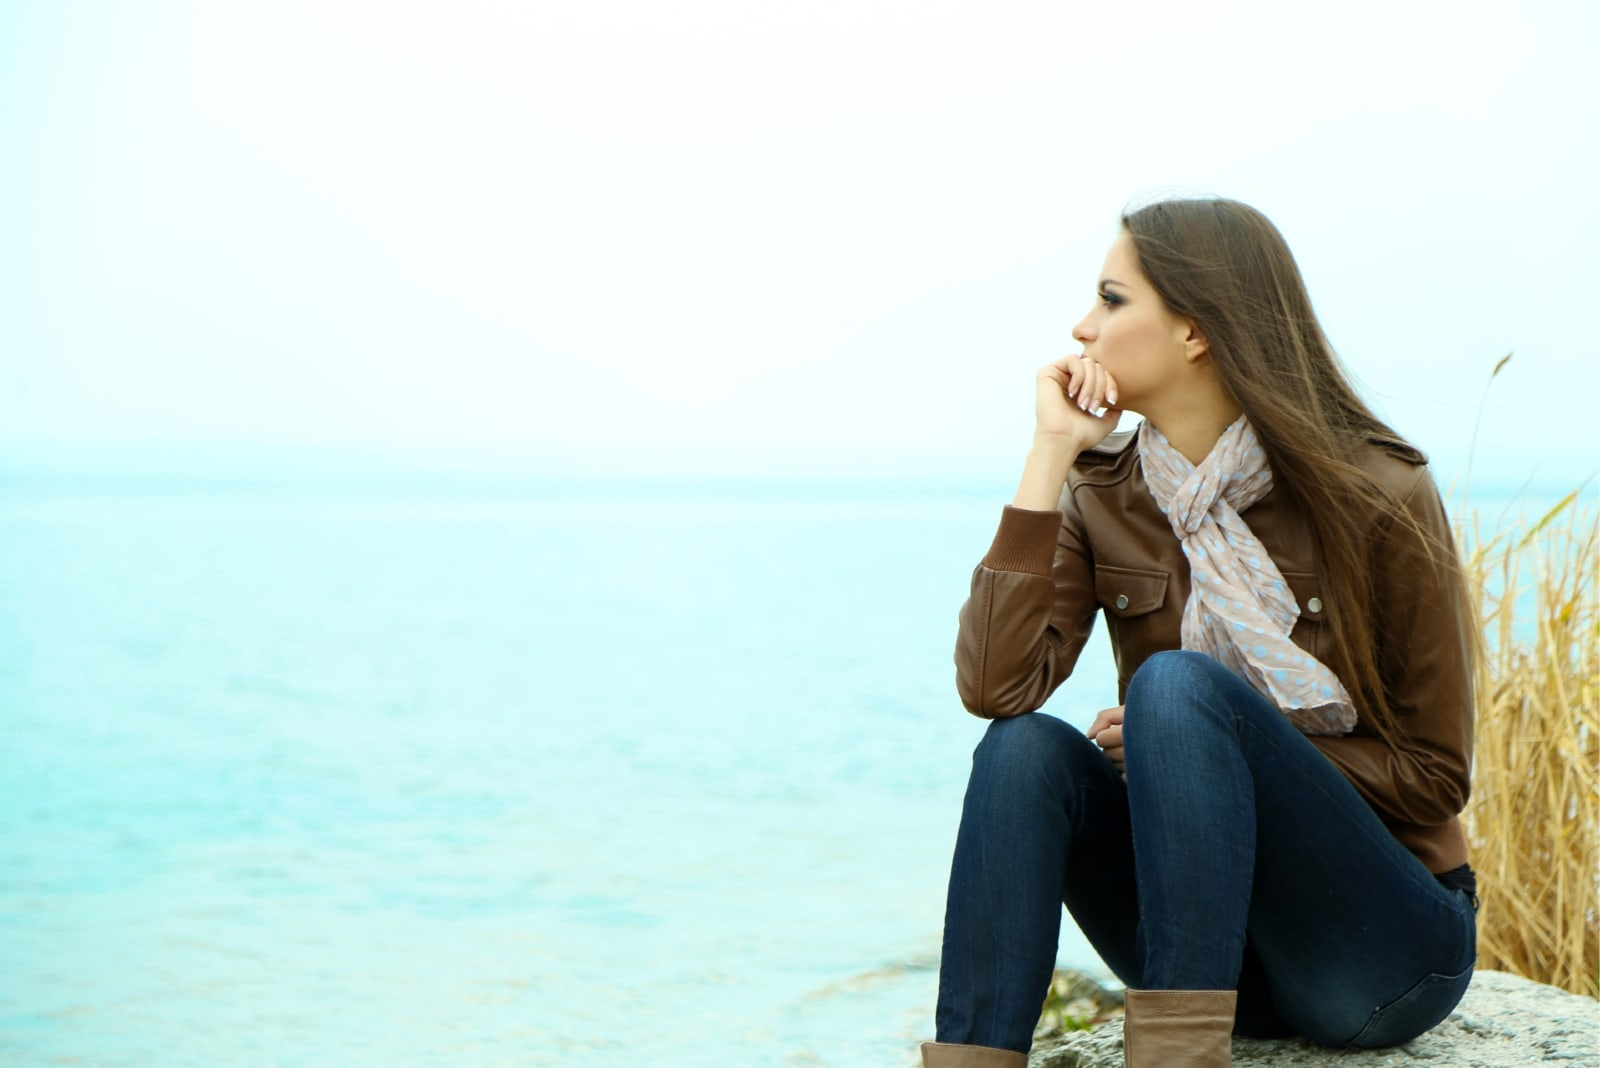 pensive woman in brown jacket sitting near water